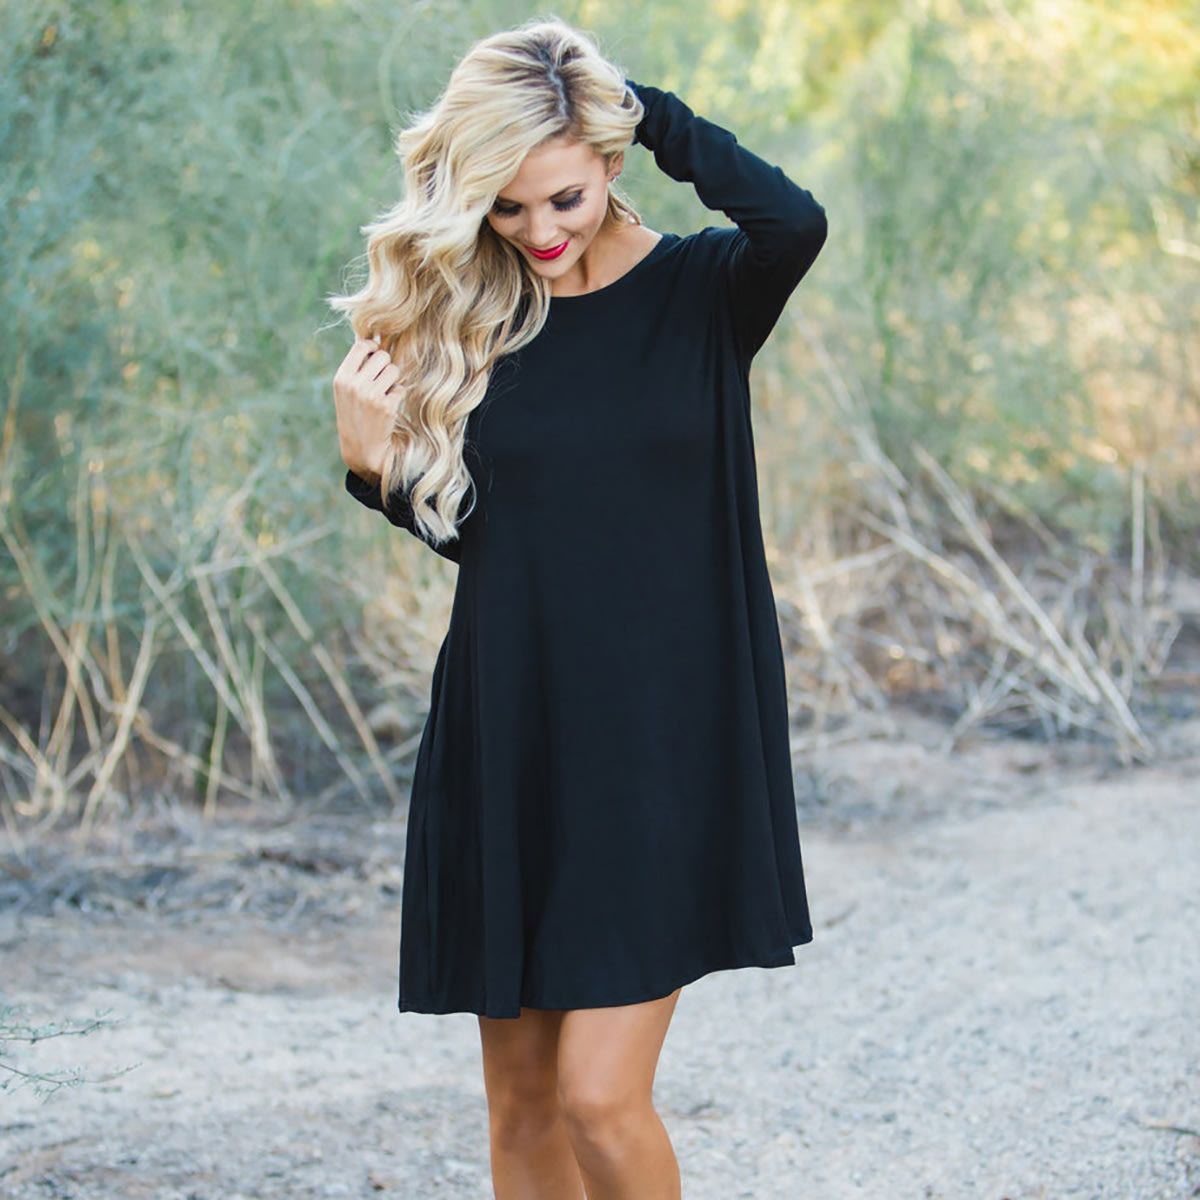 Long Sleeve T Shirt Dress With Pockets Long Sleeve Tshirt Dress Long Sleeve Swing Dress Black Long Sleeve Tshirt [ 1200 x 1200 Pixel ]